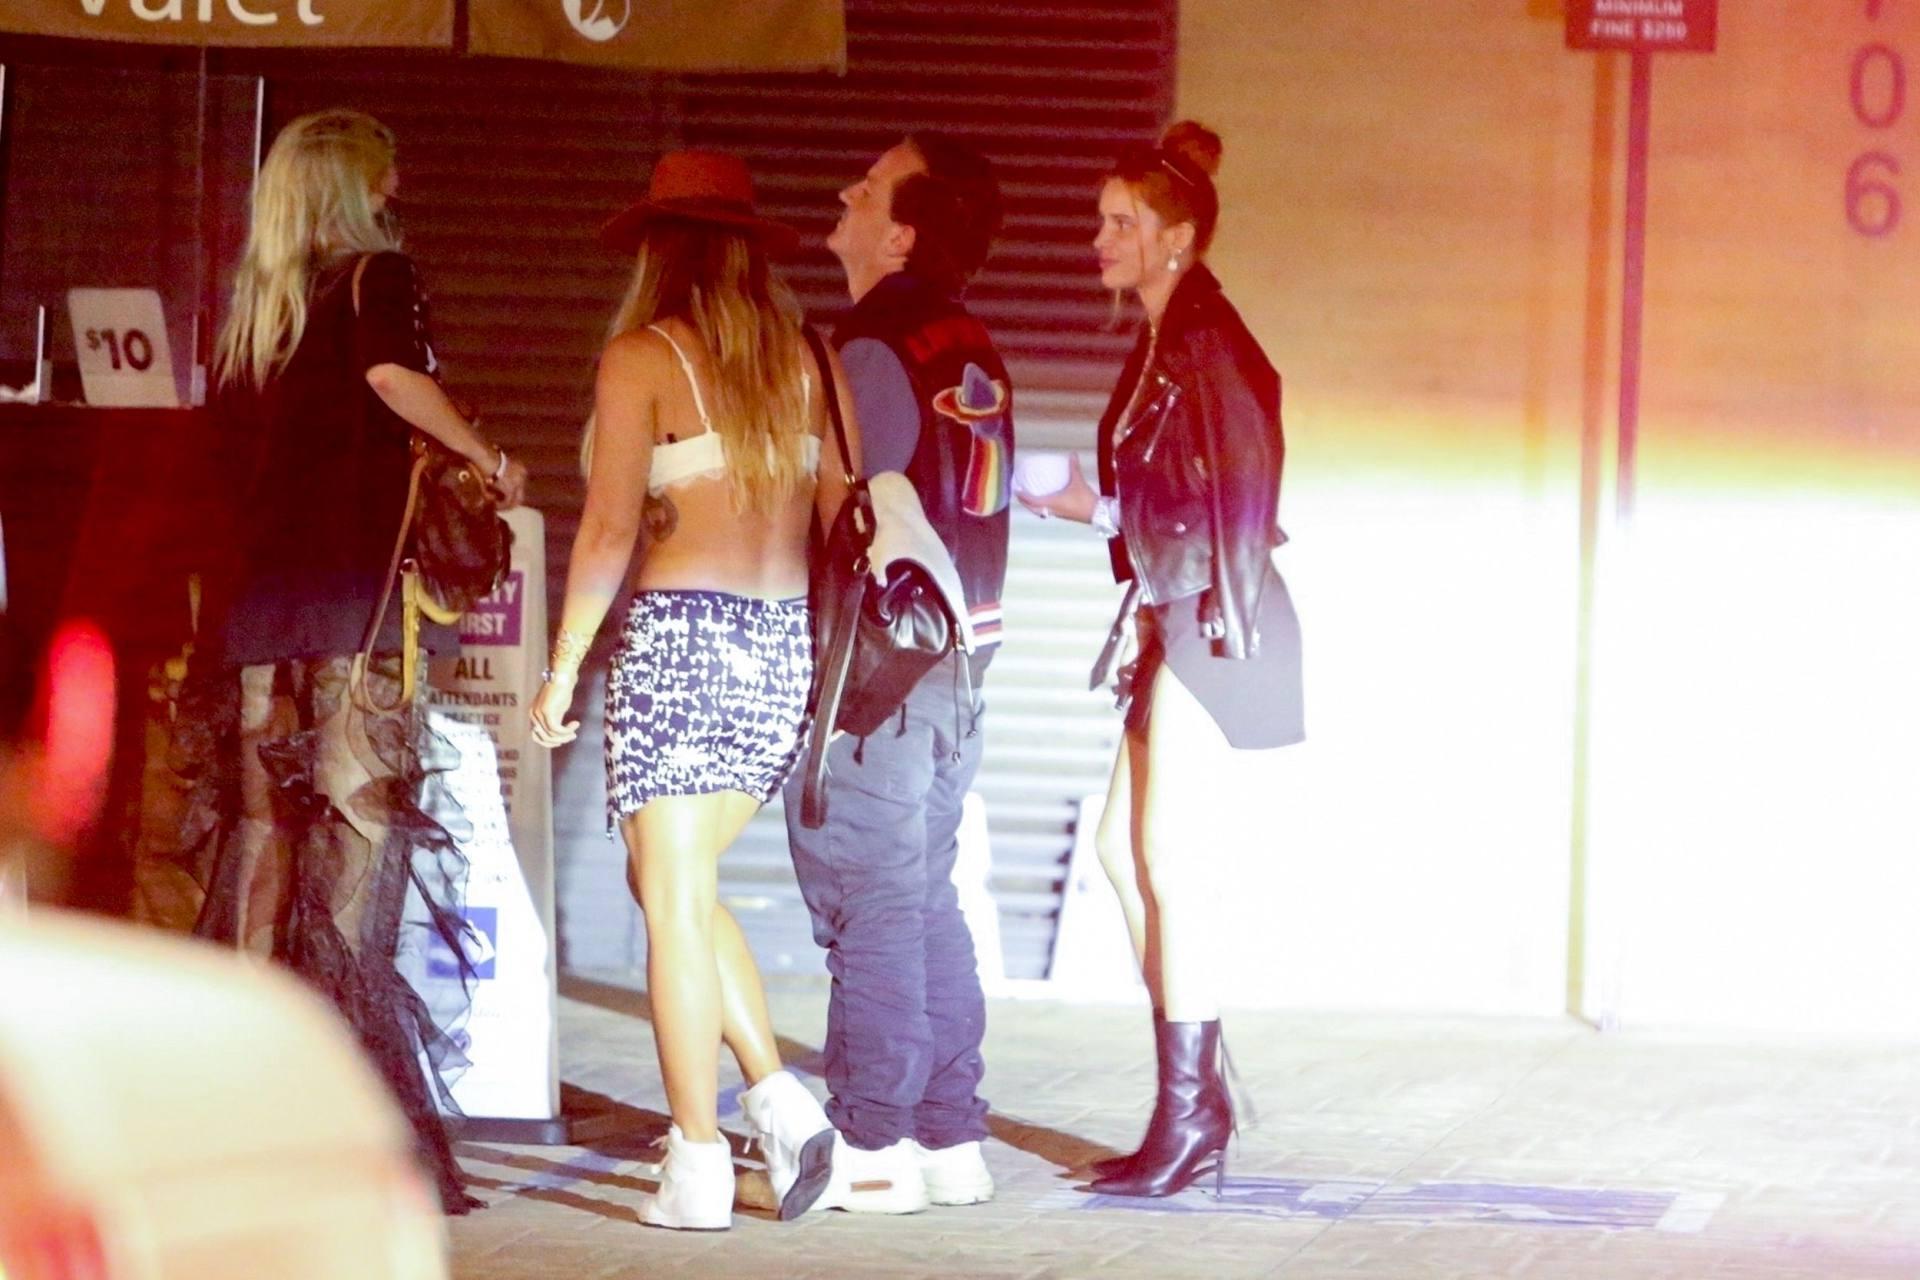 Bella & Dani Thorne – Sexy Legs In Mini Skirts At Nobu In Malibu 0019